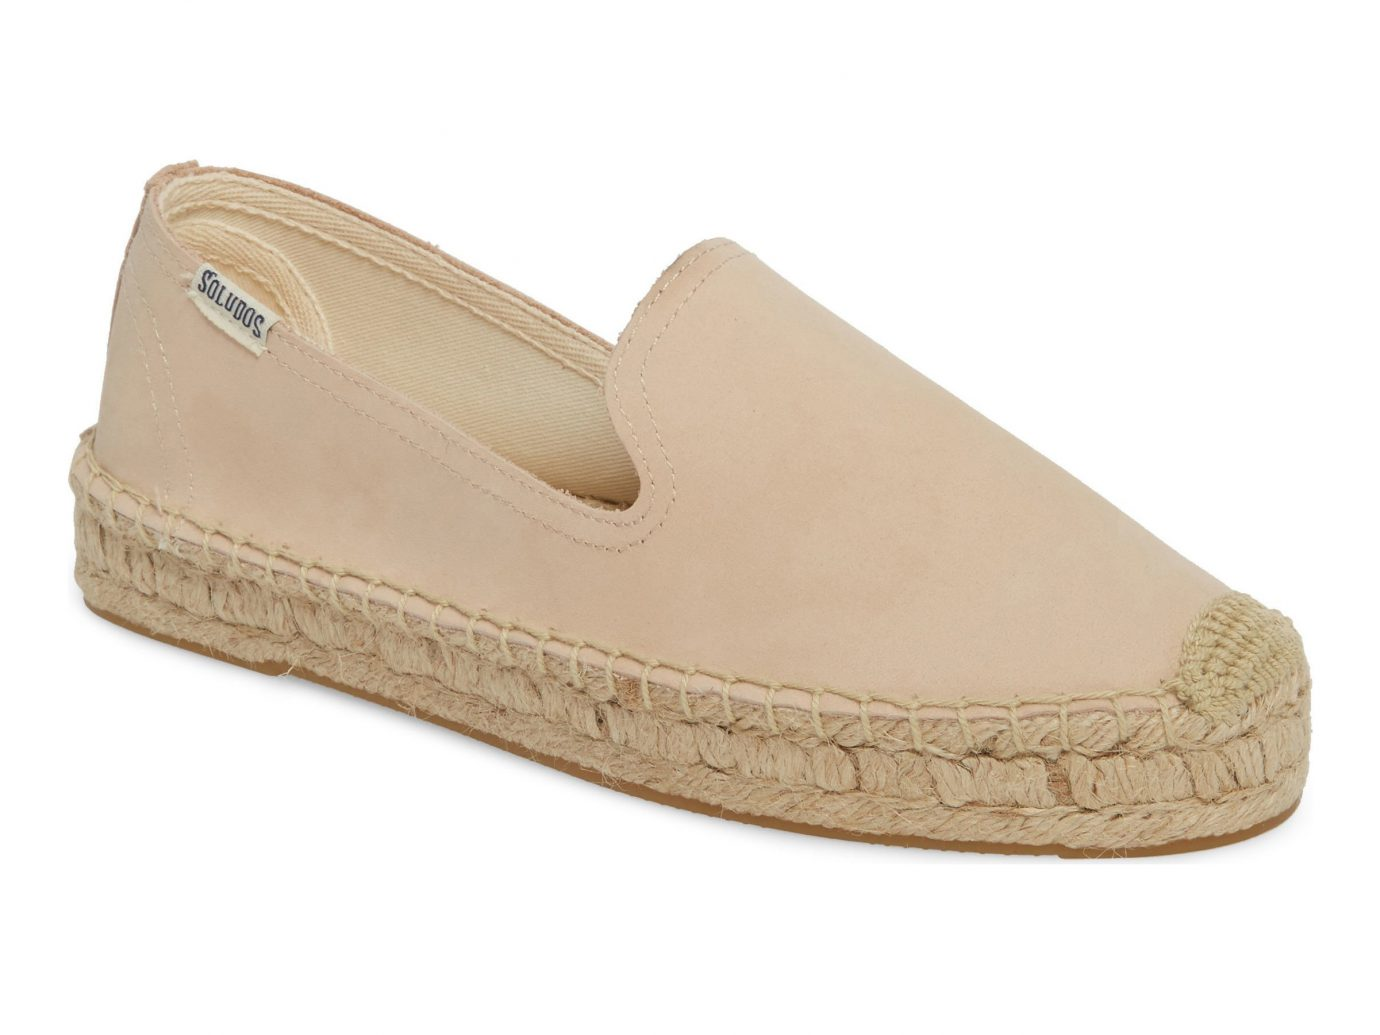 Style + Design Travel Shop footwear shoe beige product walking shoe product design